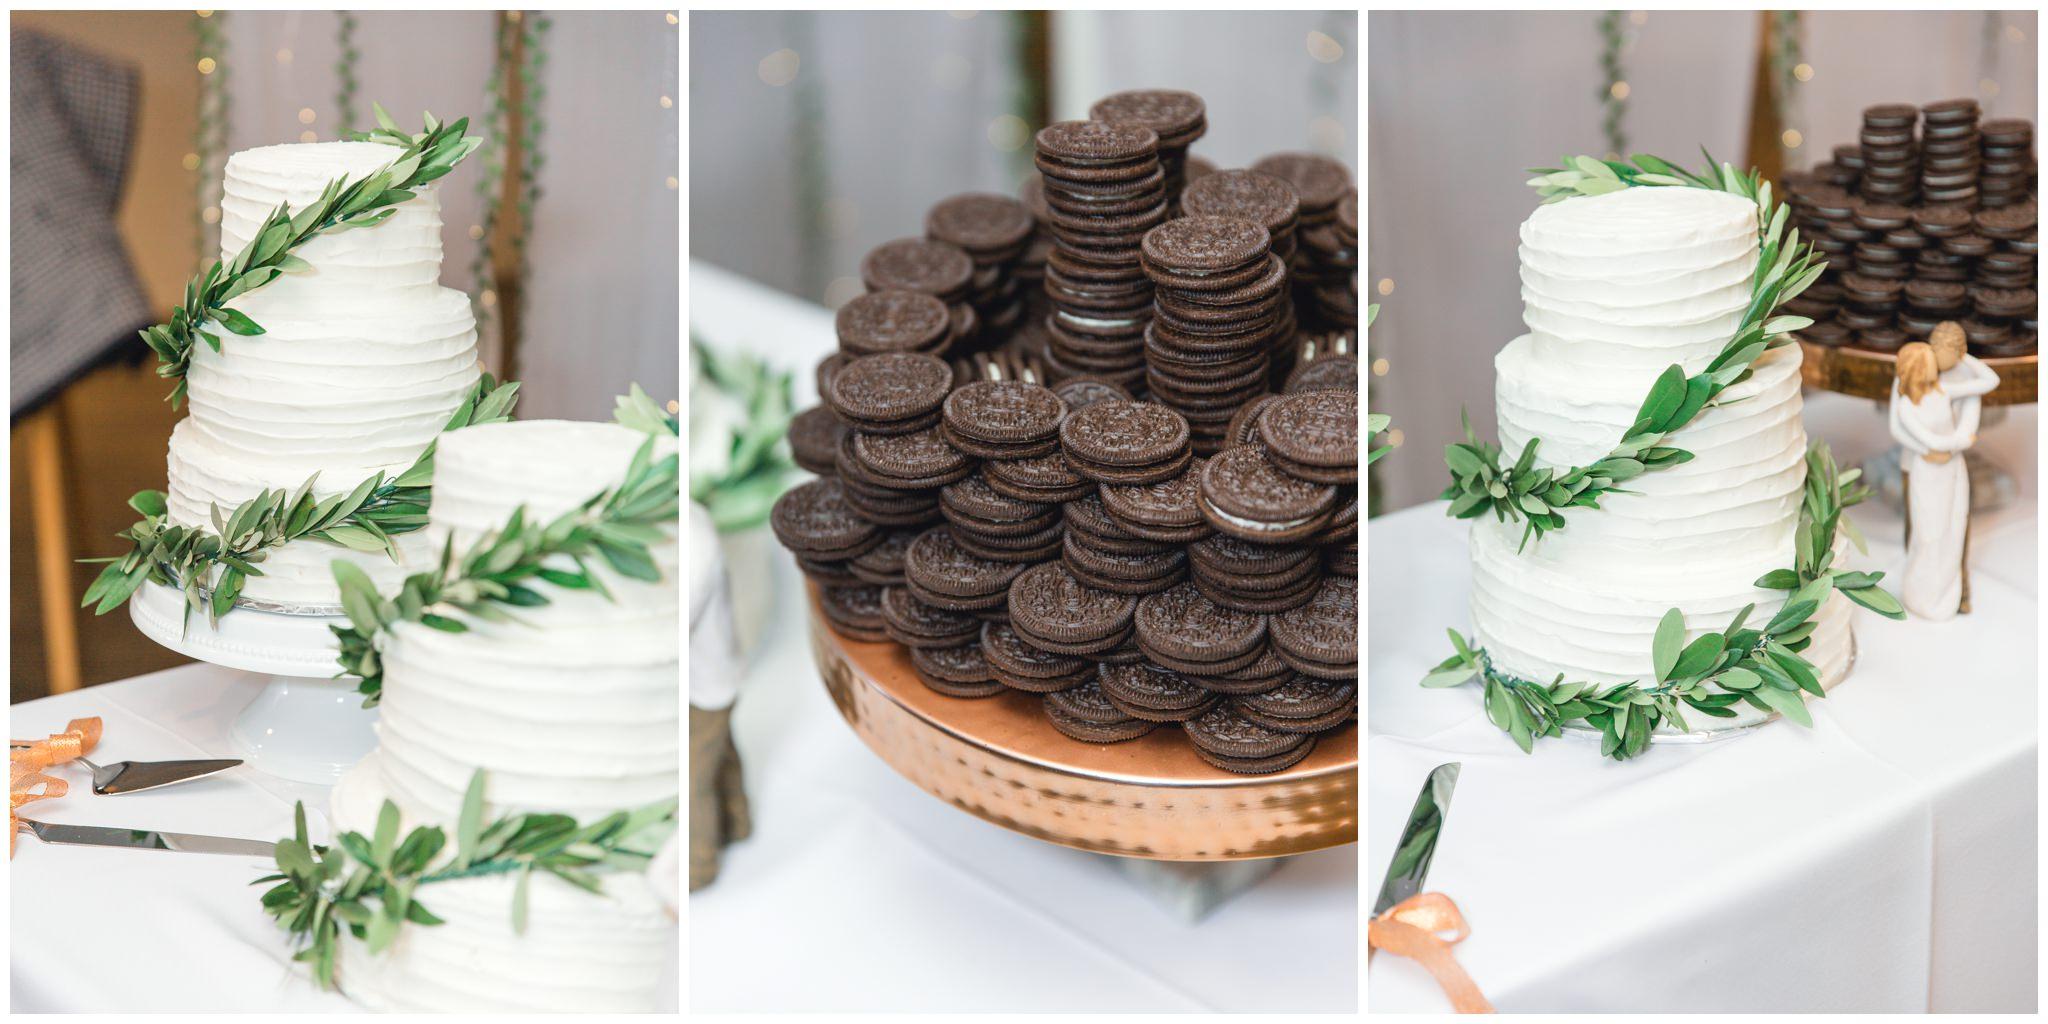 wedding cake at State House Venue in Orem, Utah